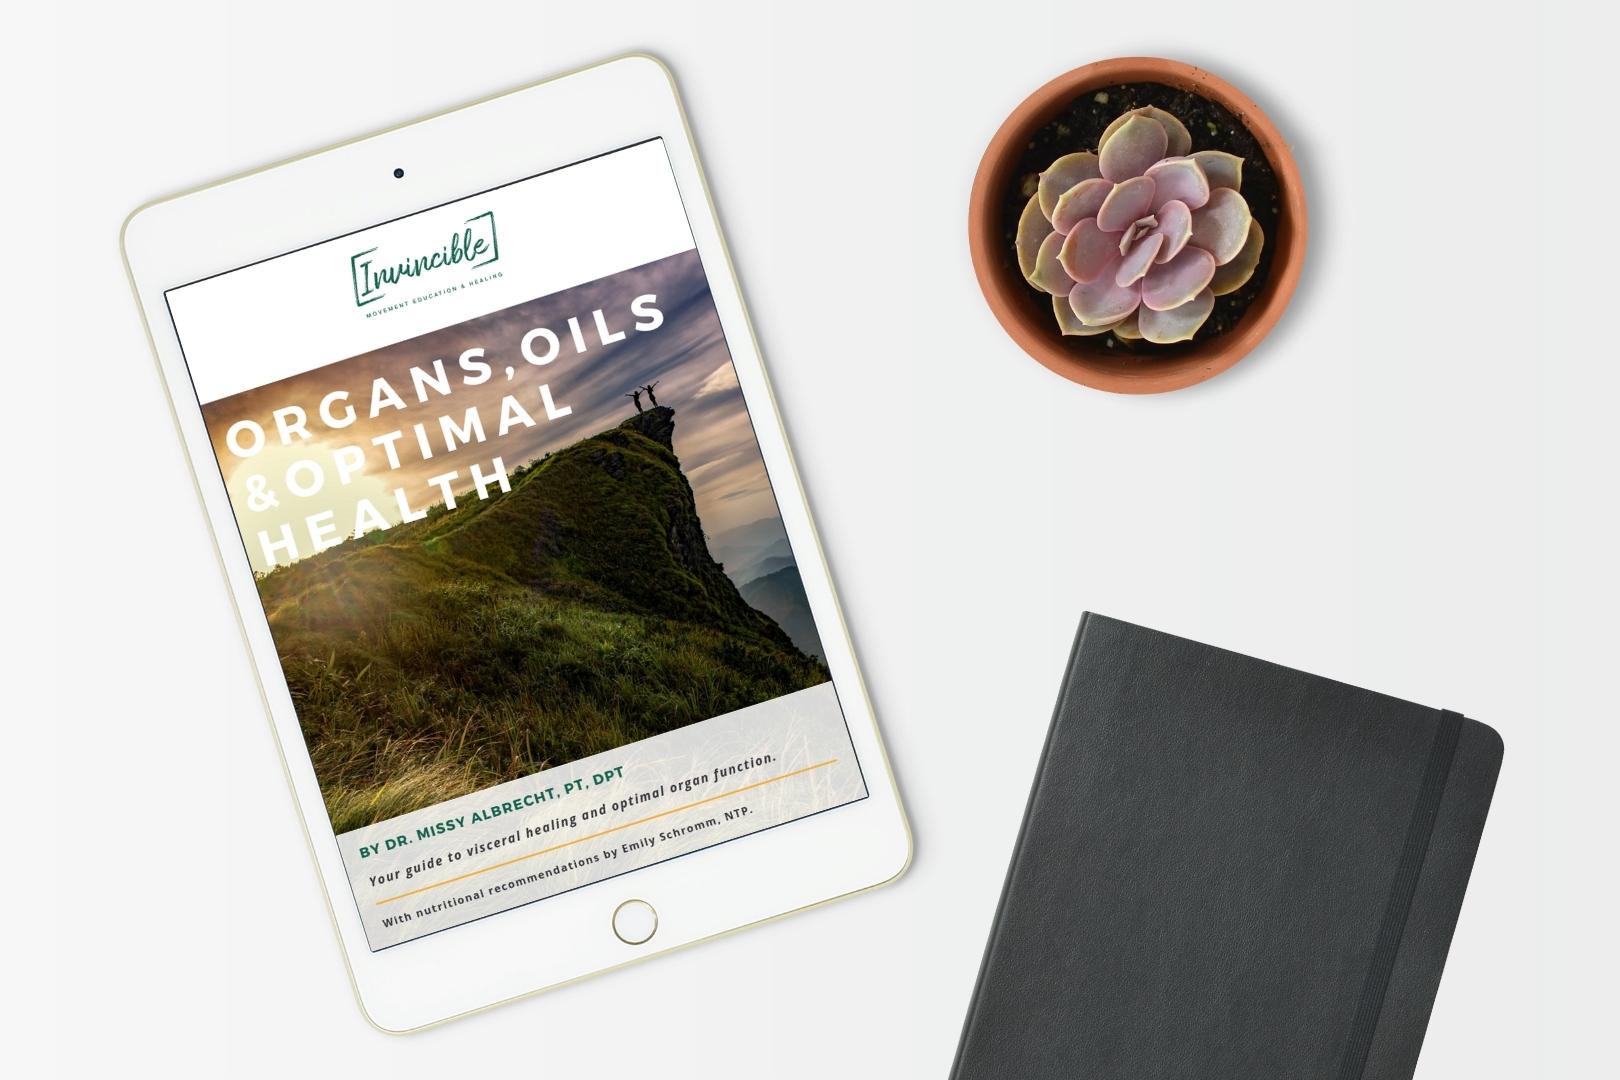 Organs, Oils and Optimal Health